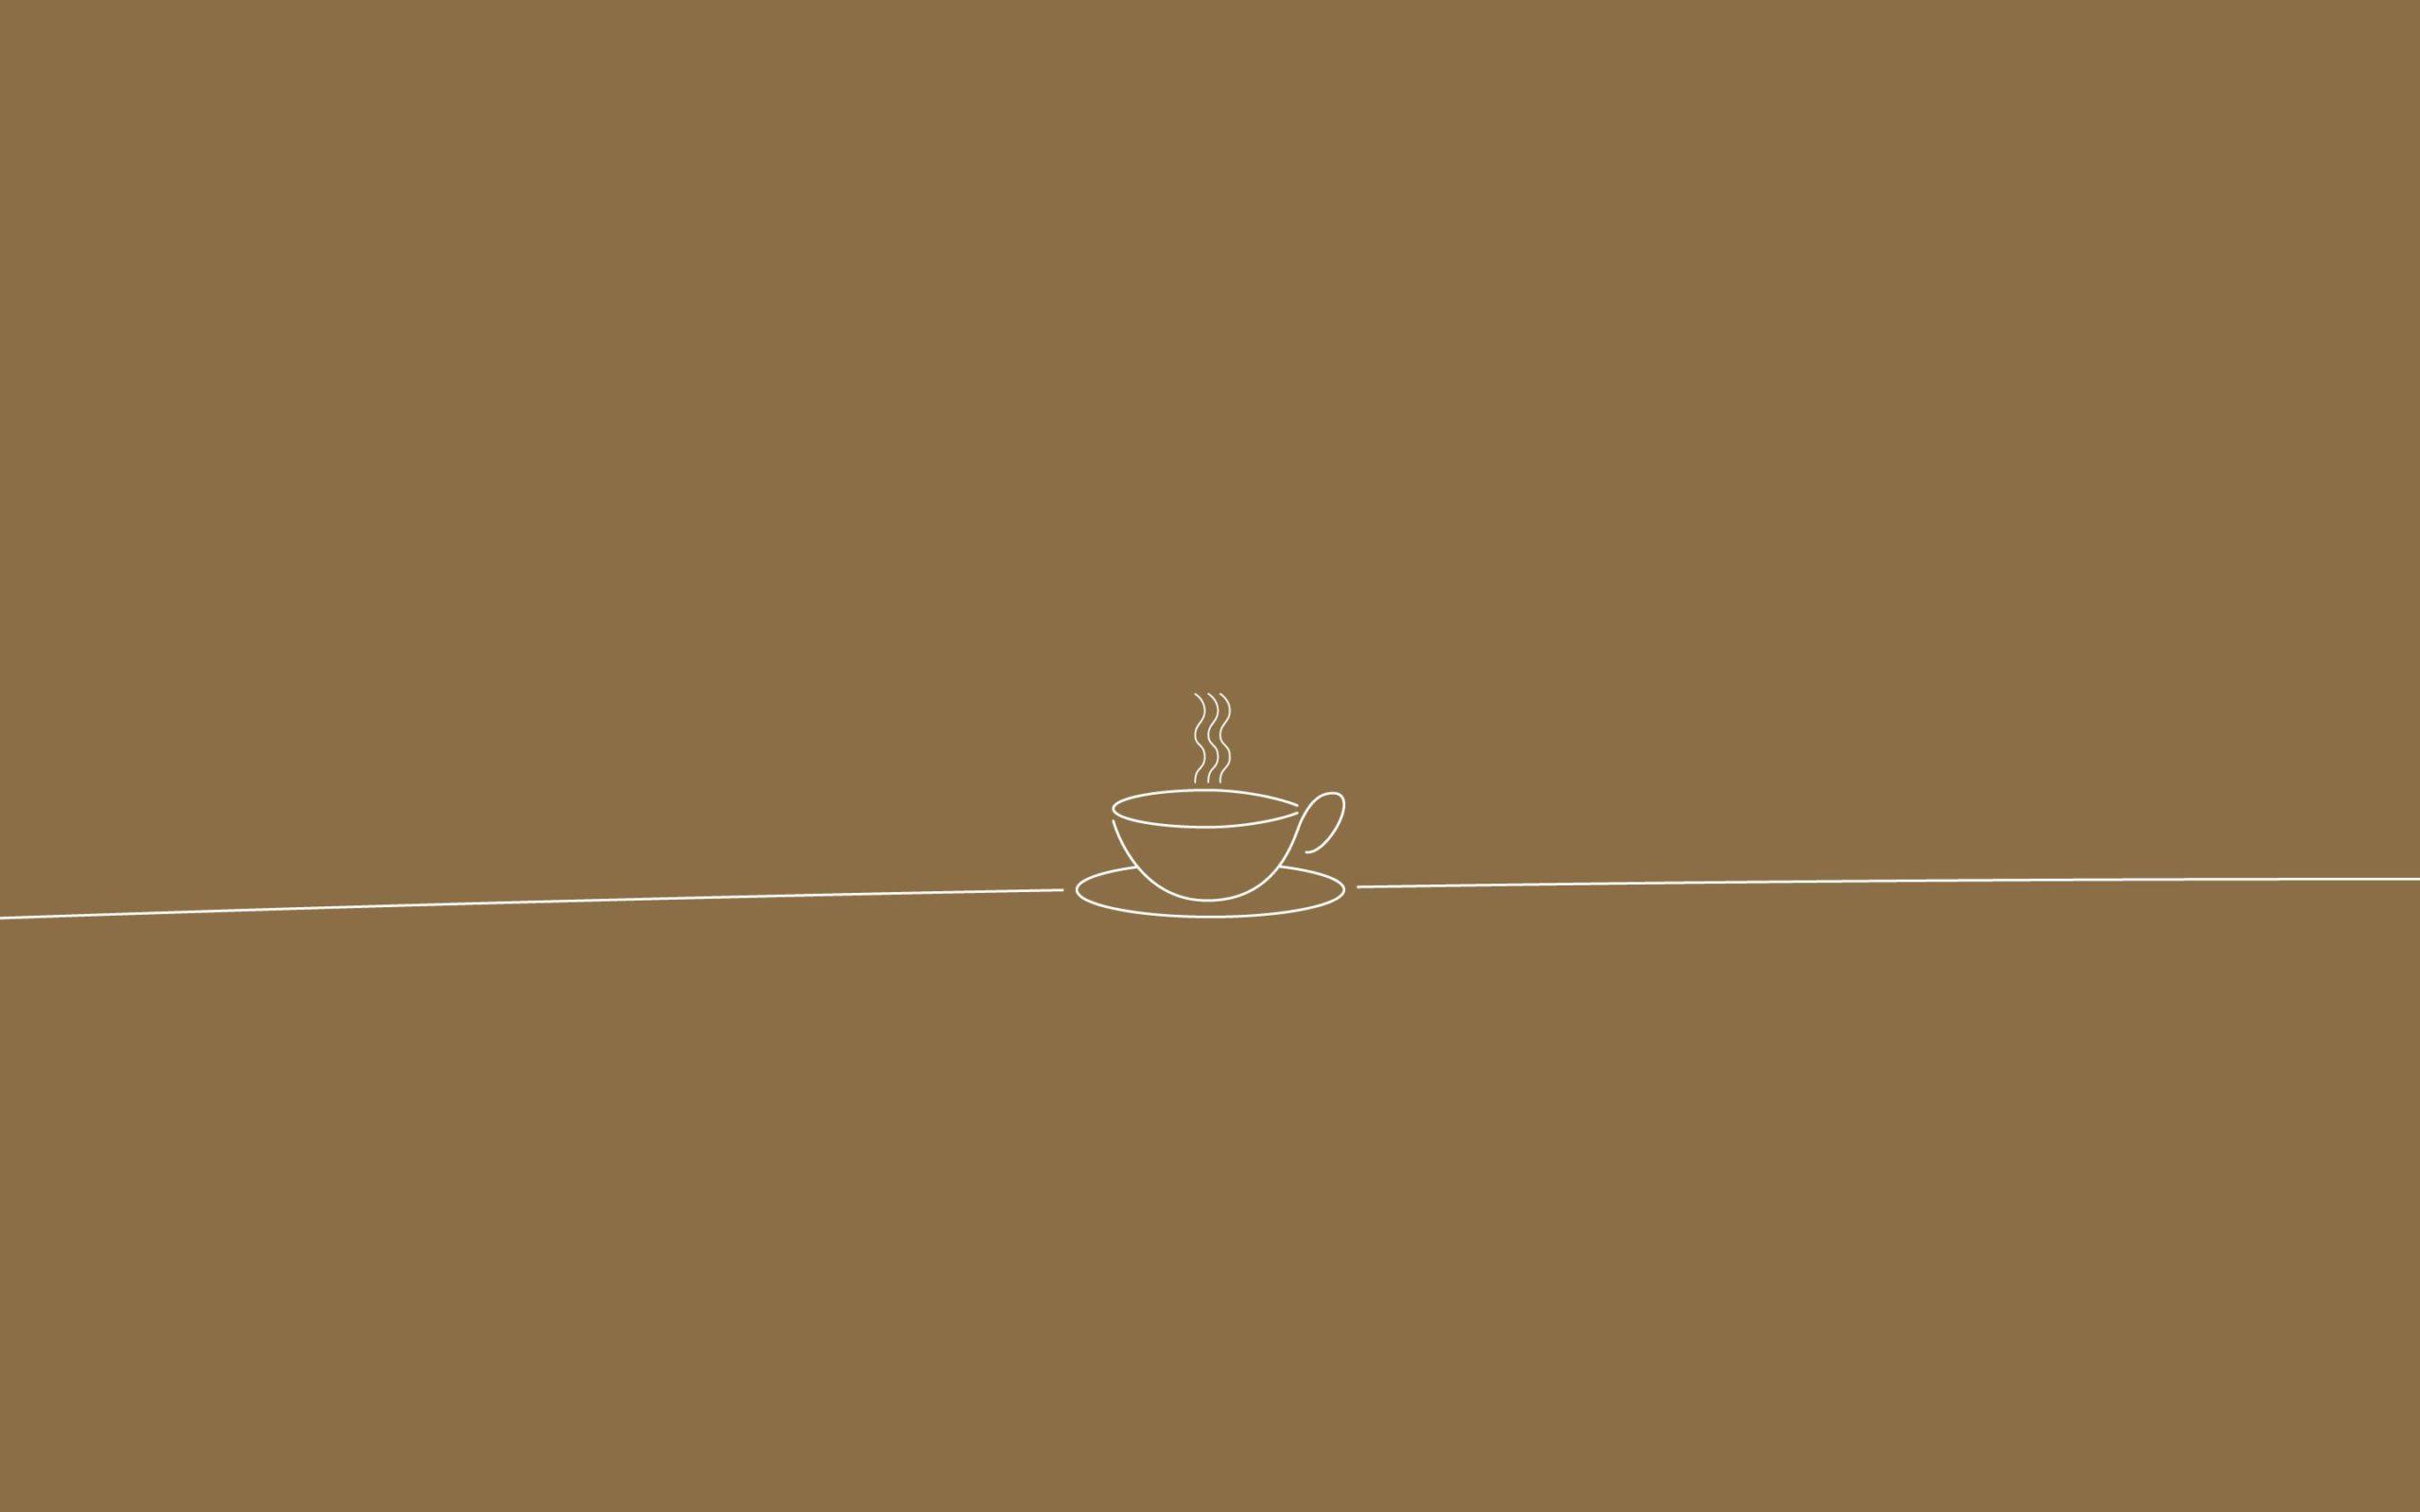 coffee wallpaper hd